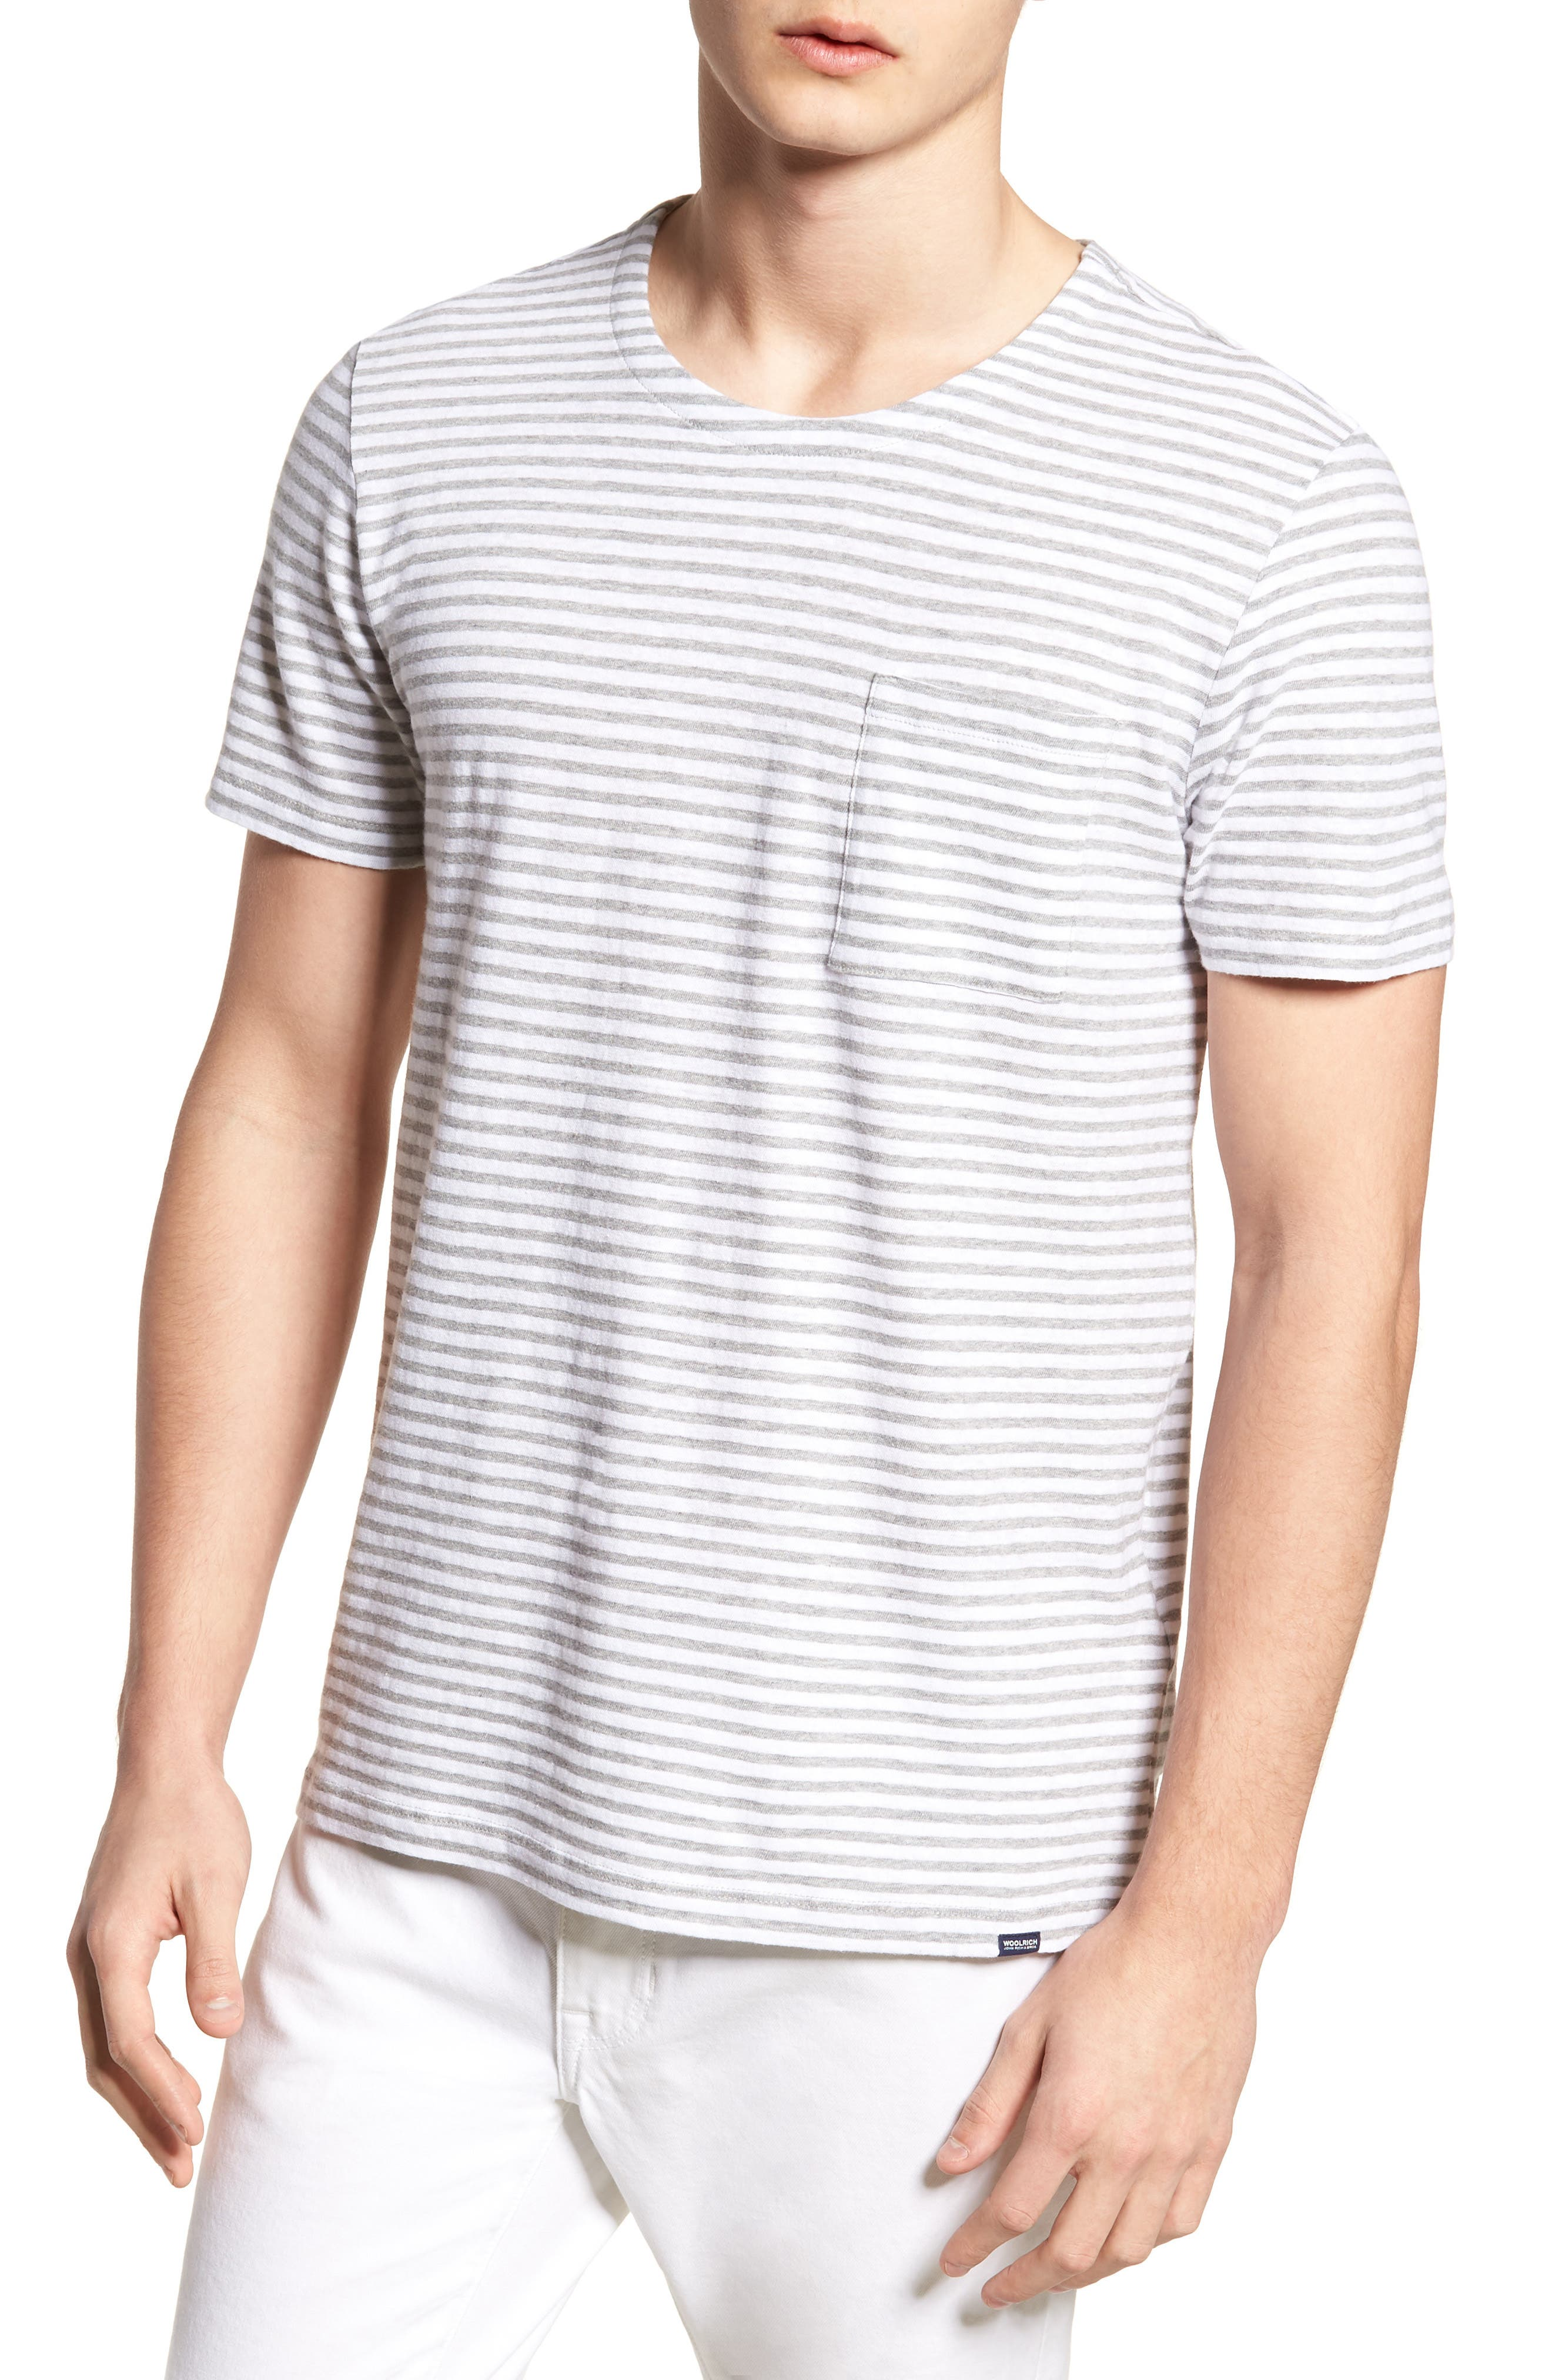 & Bros. Stripe Crewneck T-Shirt,                             Main thumbnail 1, color,                             White Stripe